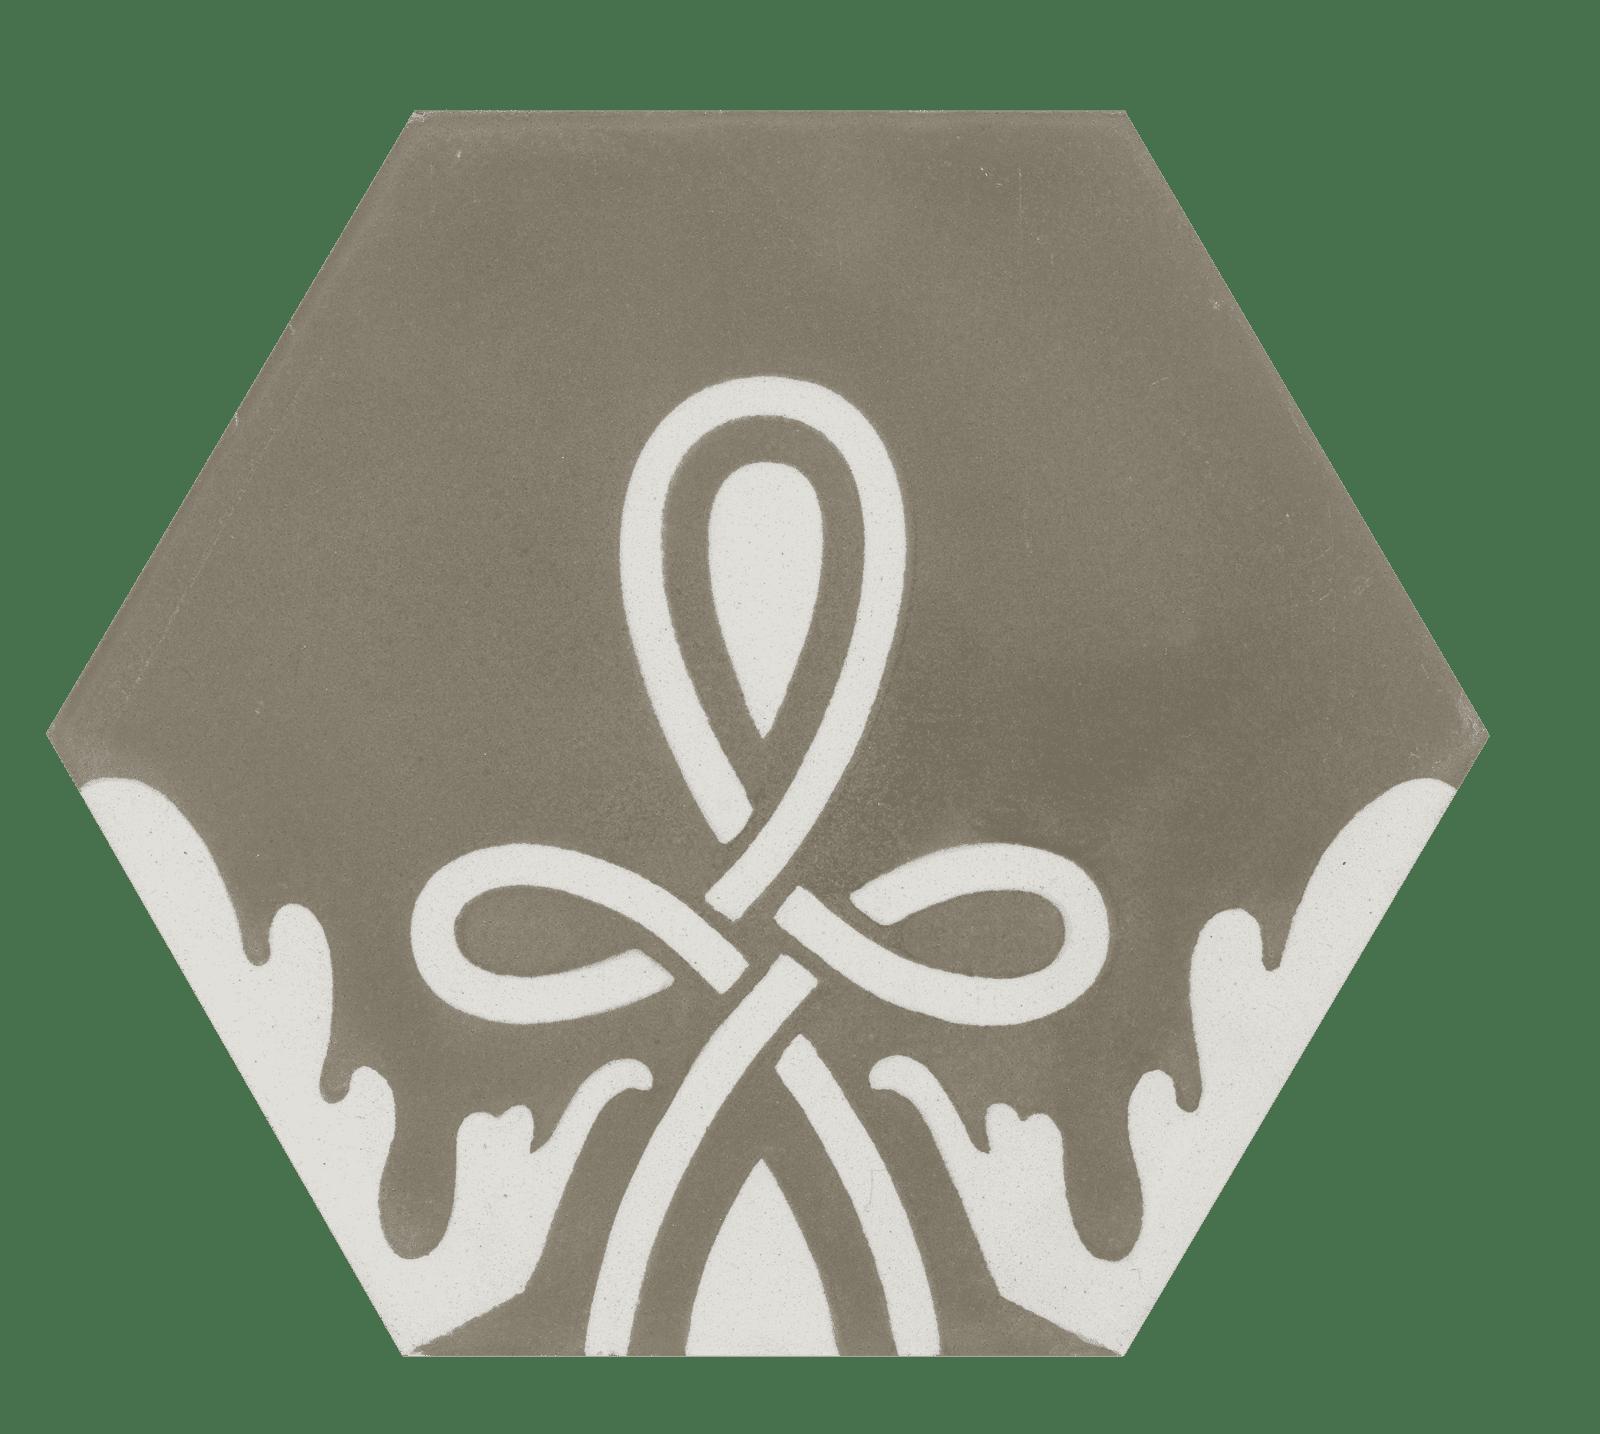 zementmosaikfliesen-600154-viaplatten | 600154